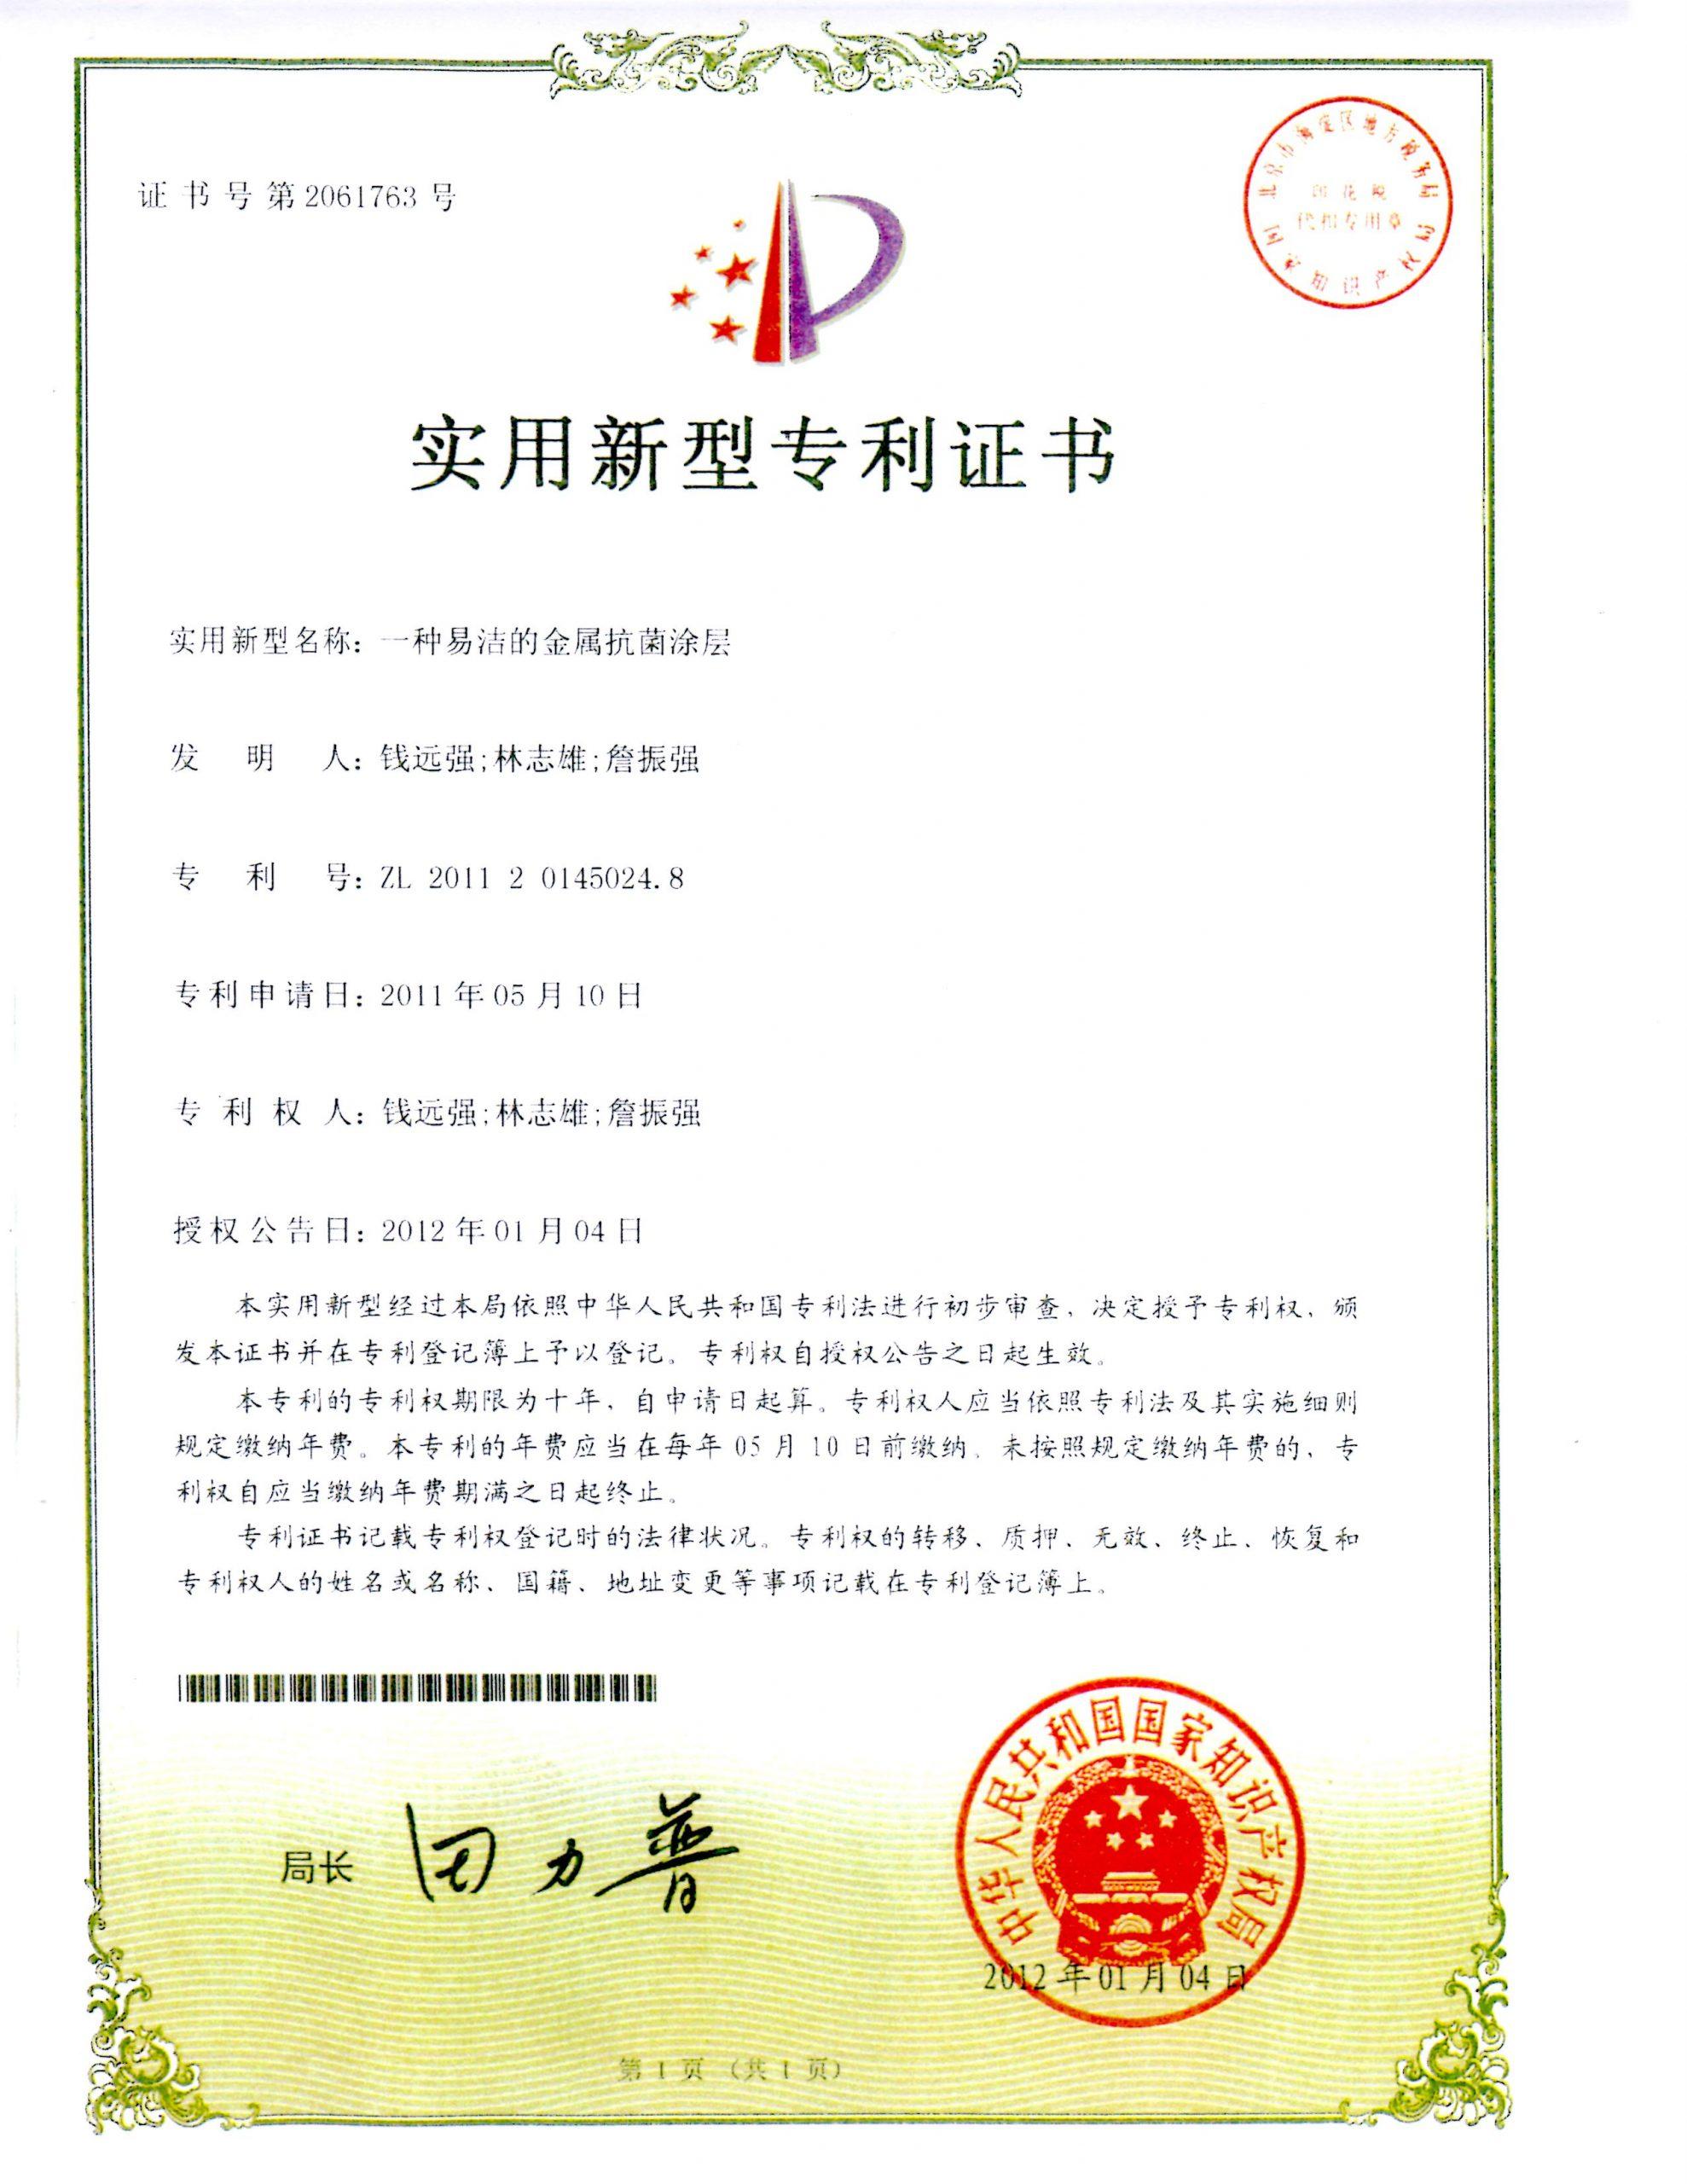 Q-Metal-Antibacterial-Utality-China-scaled